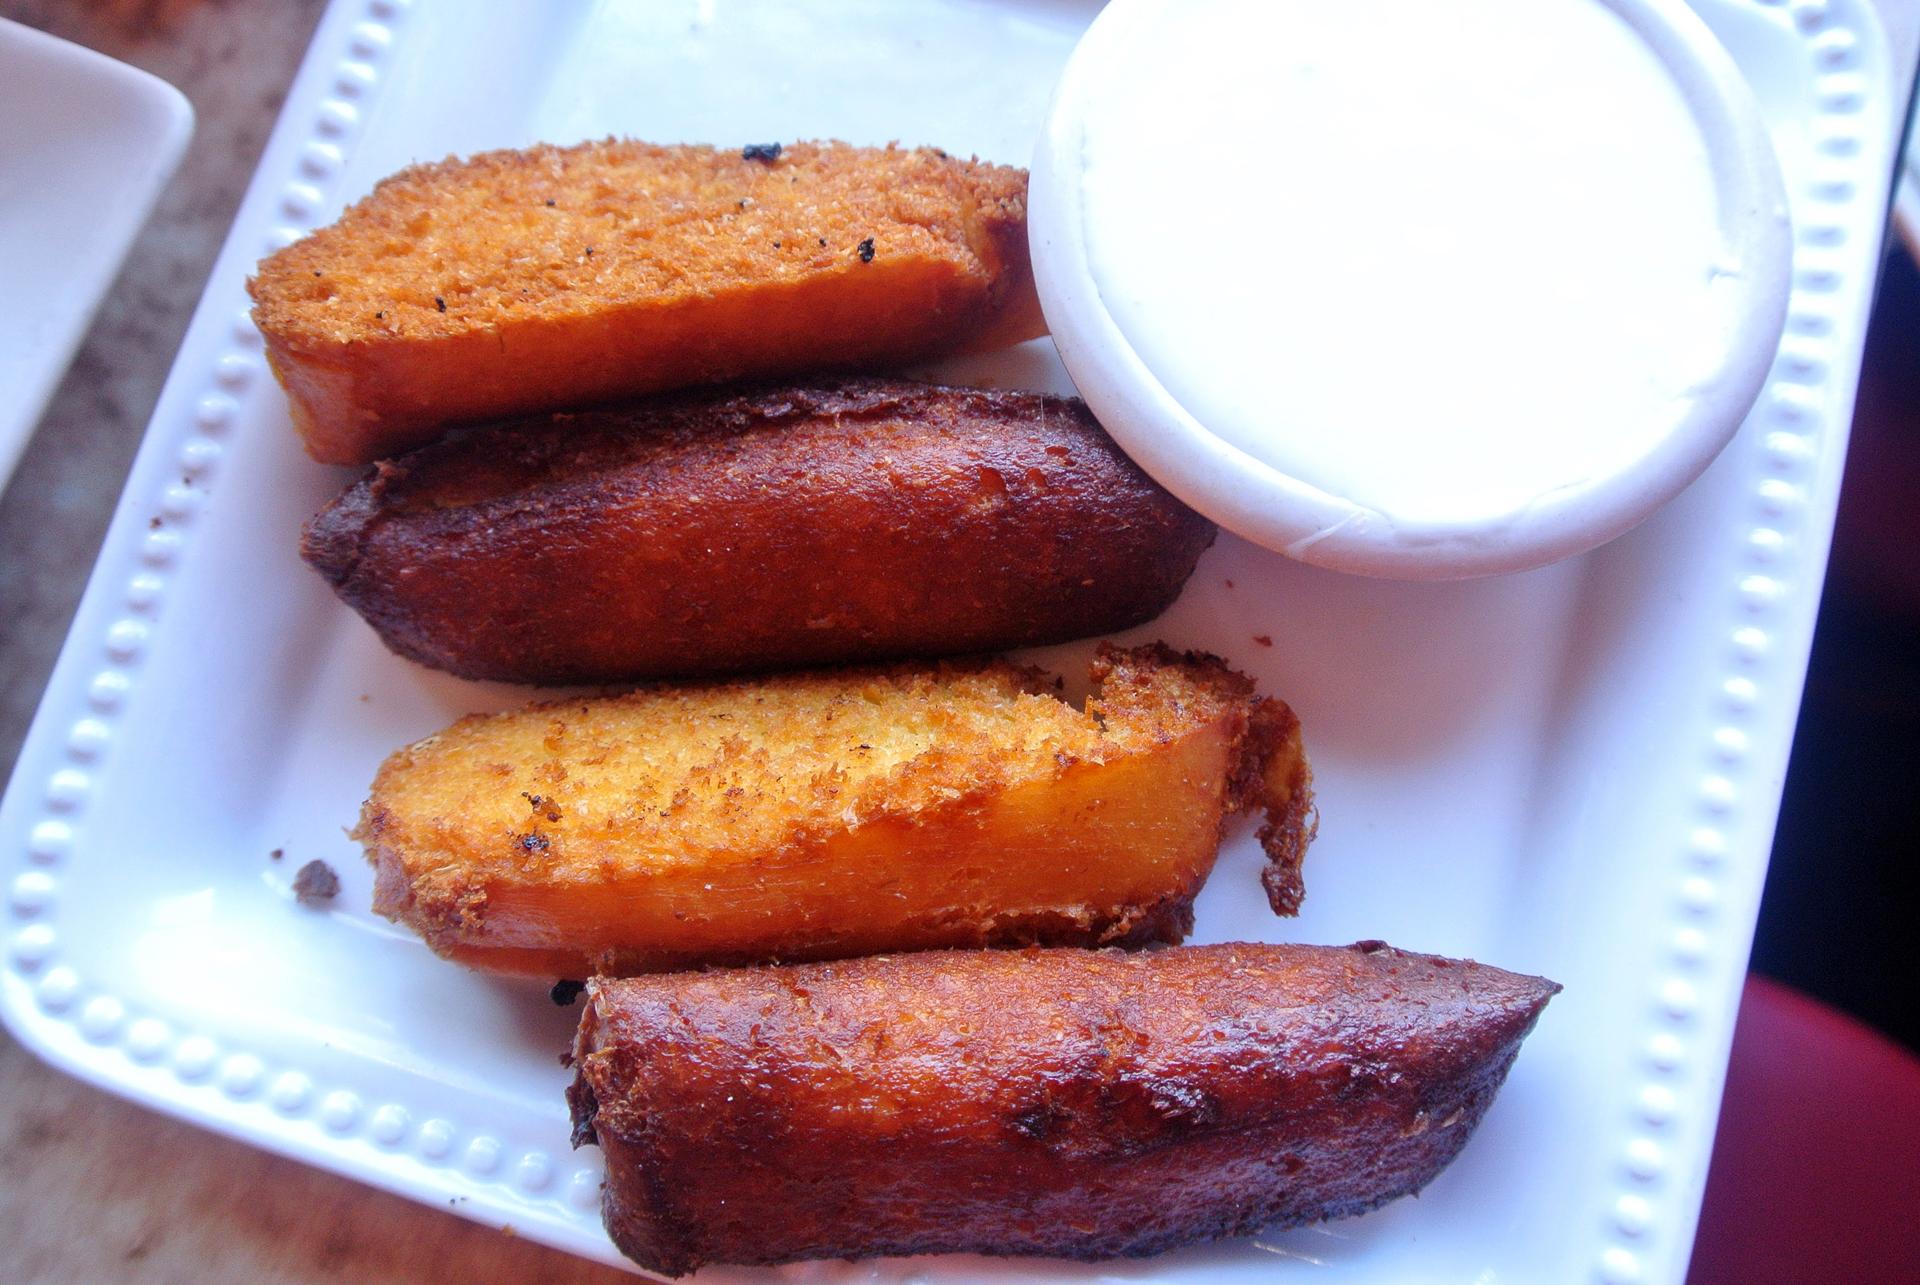 Balompie Café Tamales de Elote